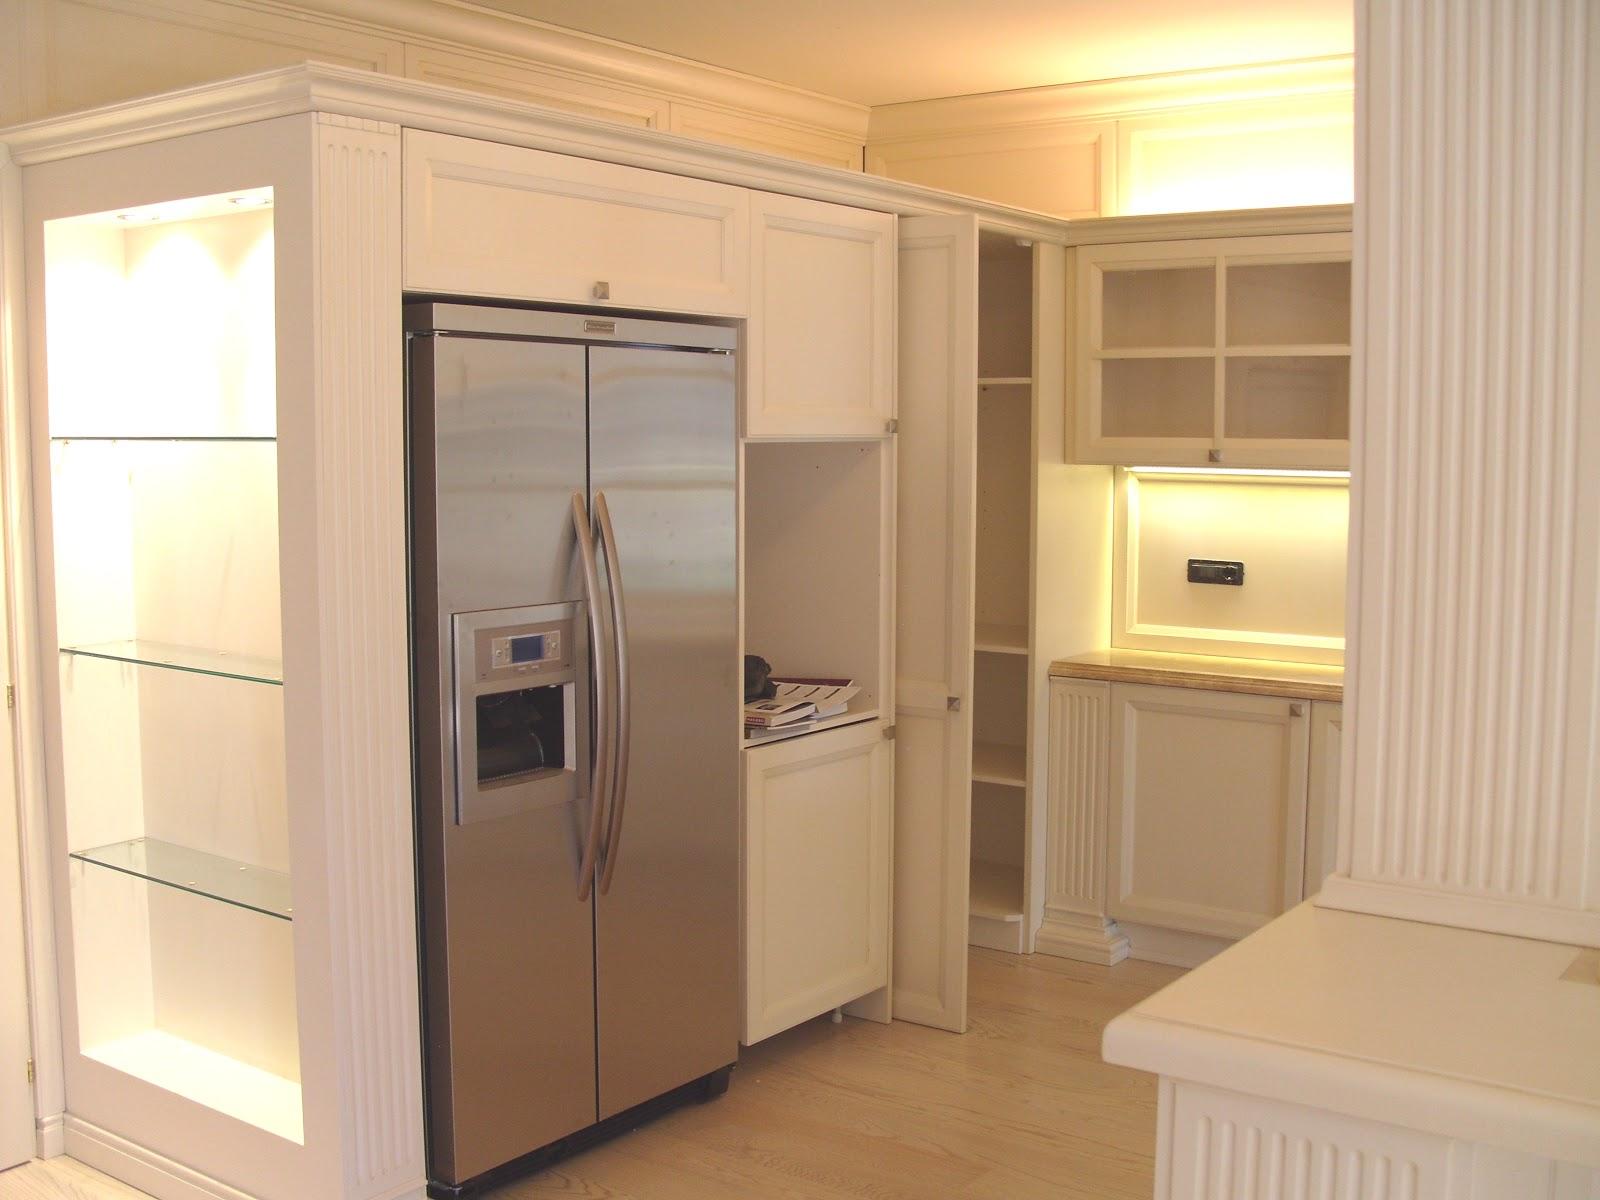 Pin cucine classiche bianche rosse verdi gialle panna - Cucine moderne gialle ...